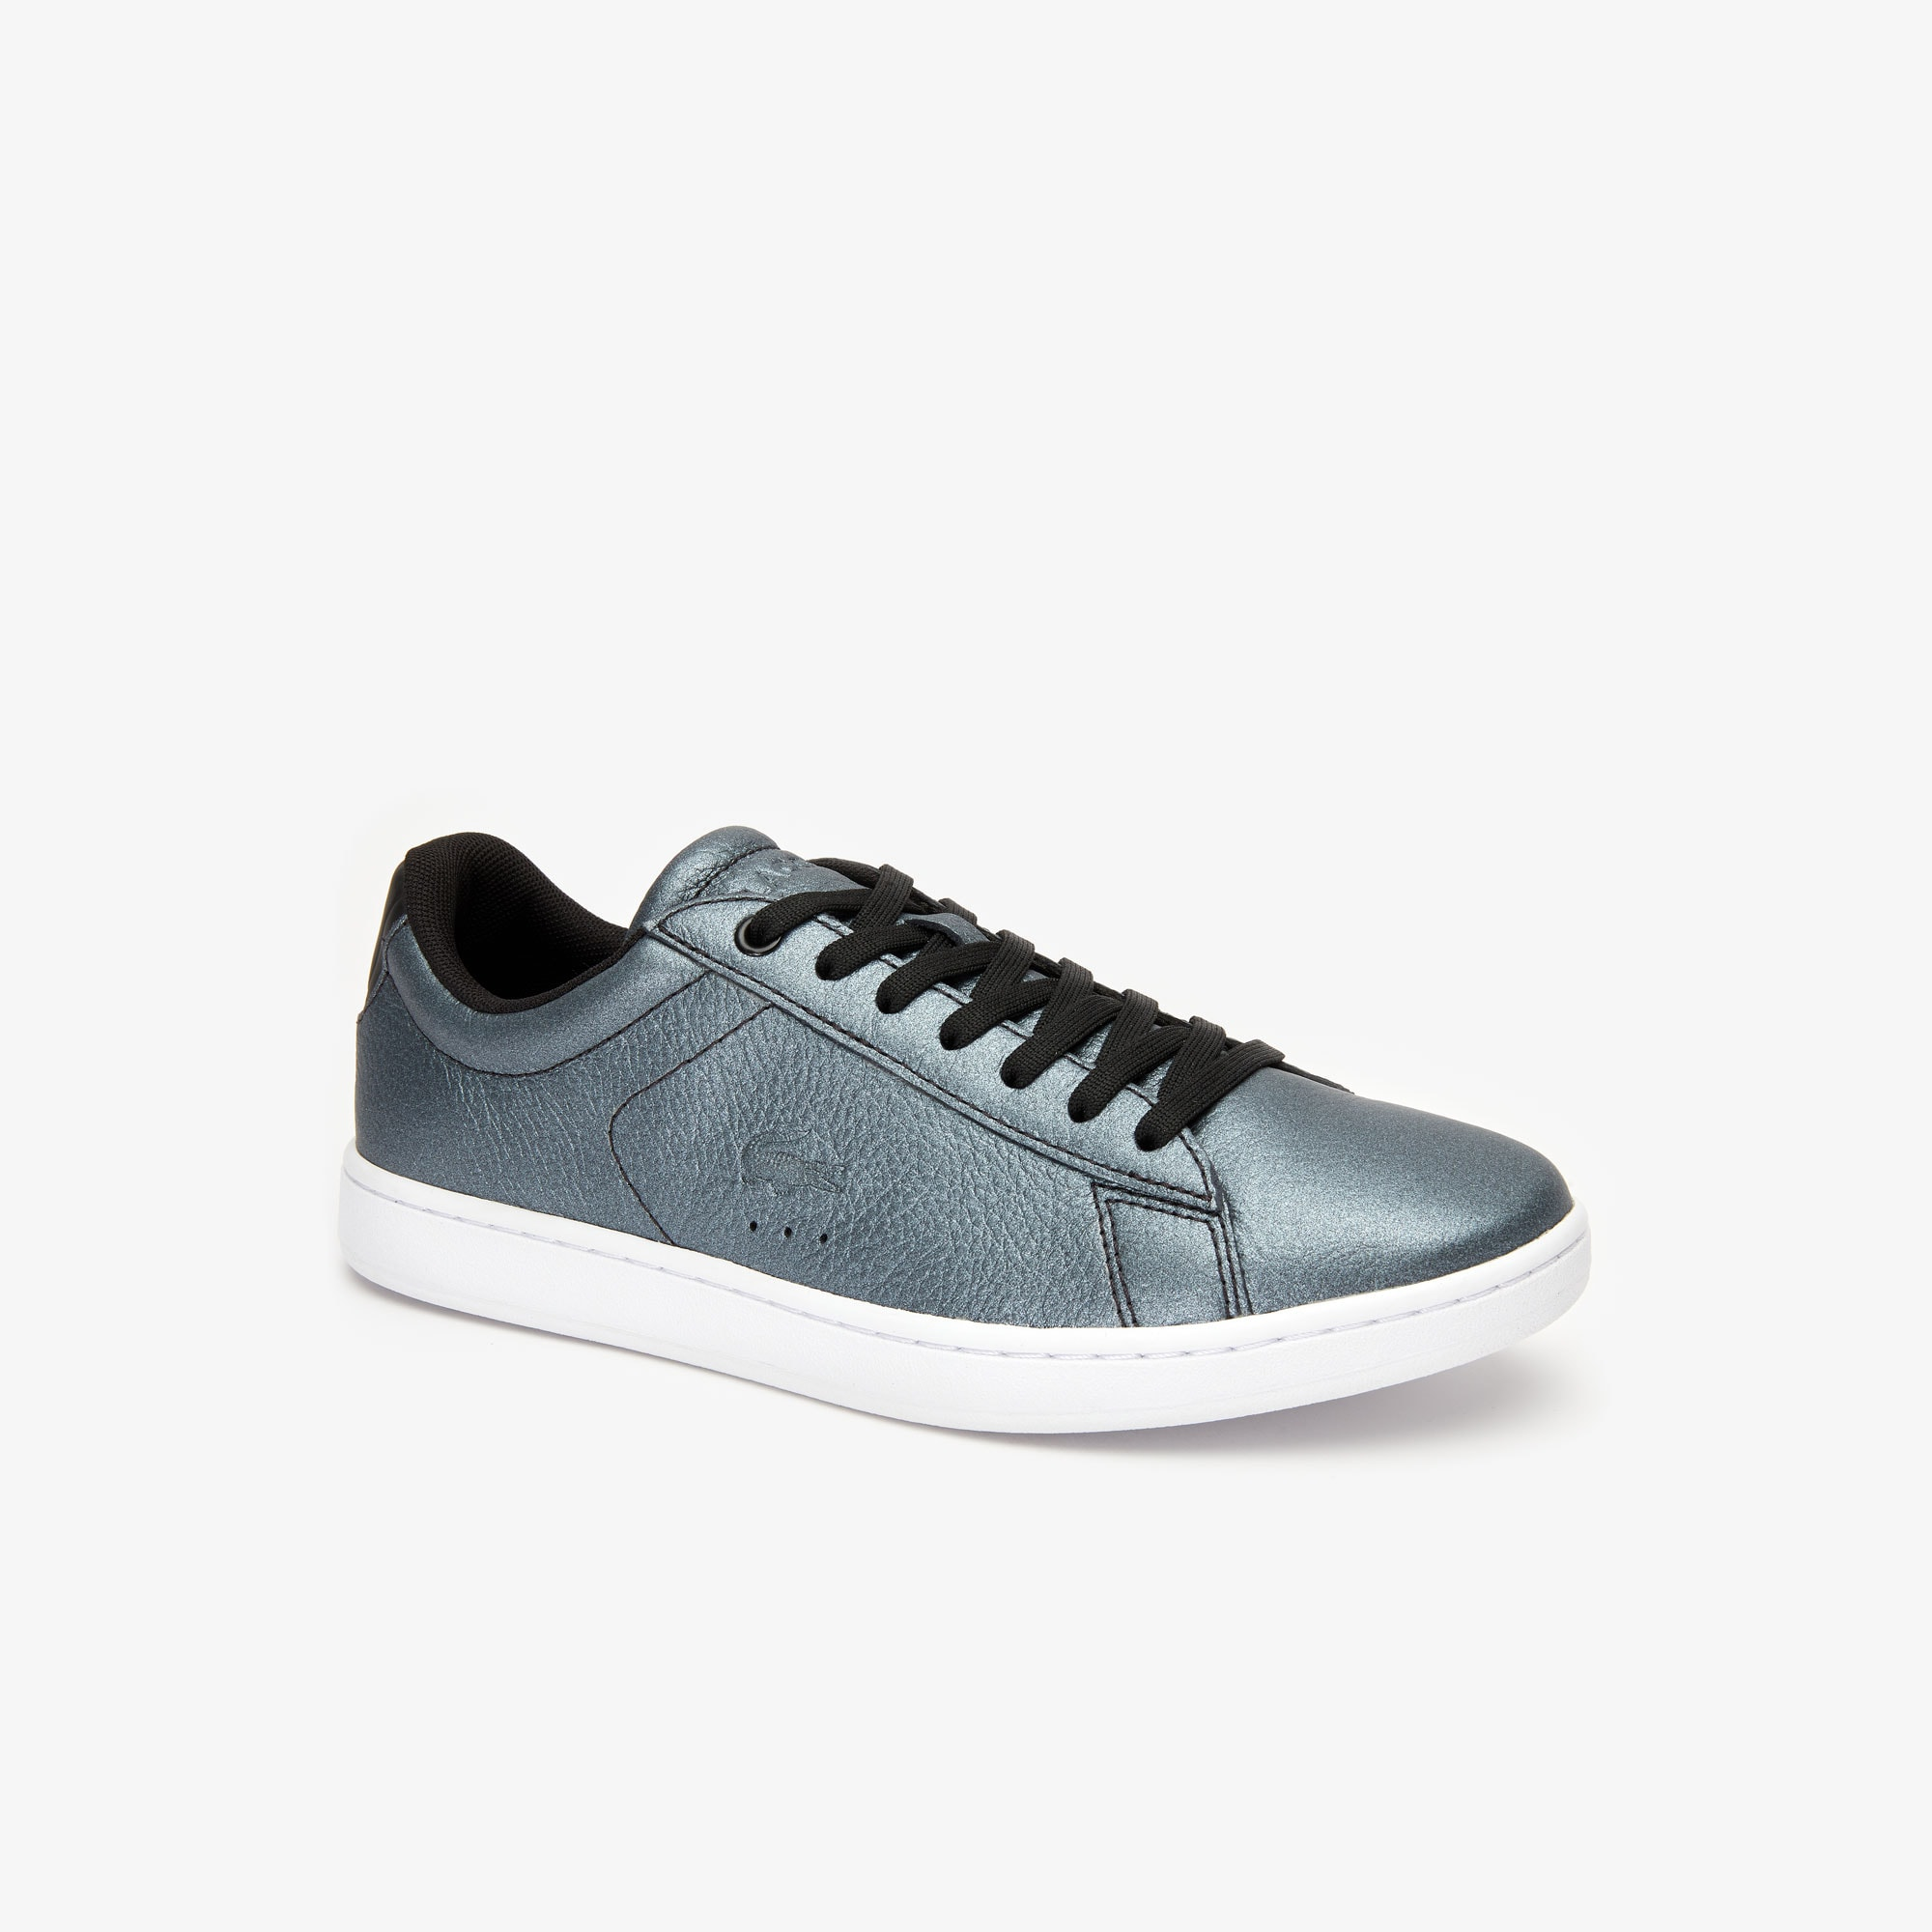 da4b740d8a Chaussures femme | Collection Femme | LACOSTE